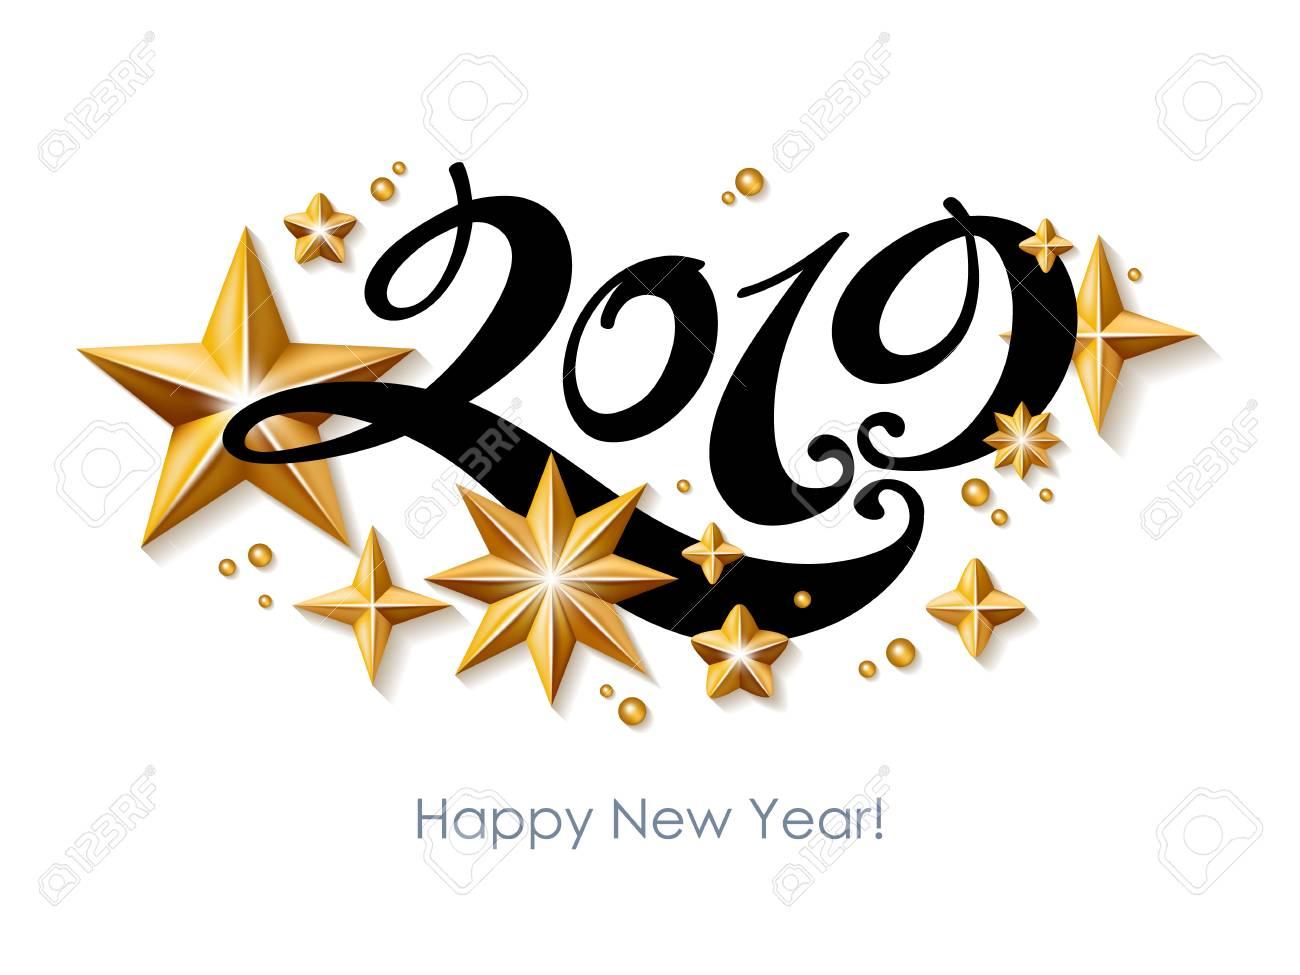 2019 Happy New Year background. Seasonal greeting card template. - 102724525